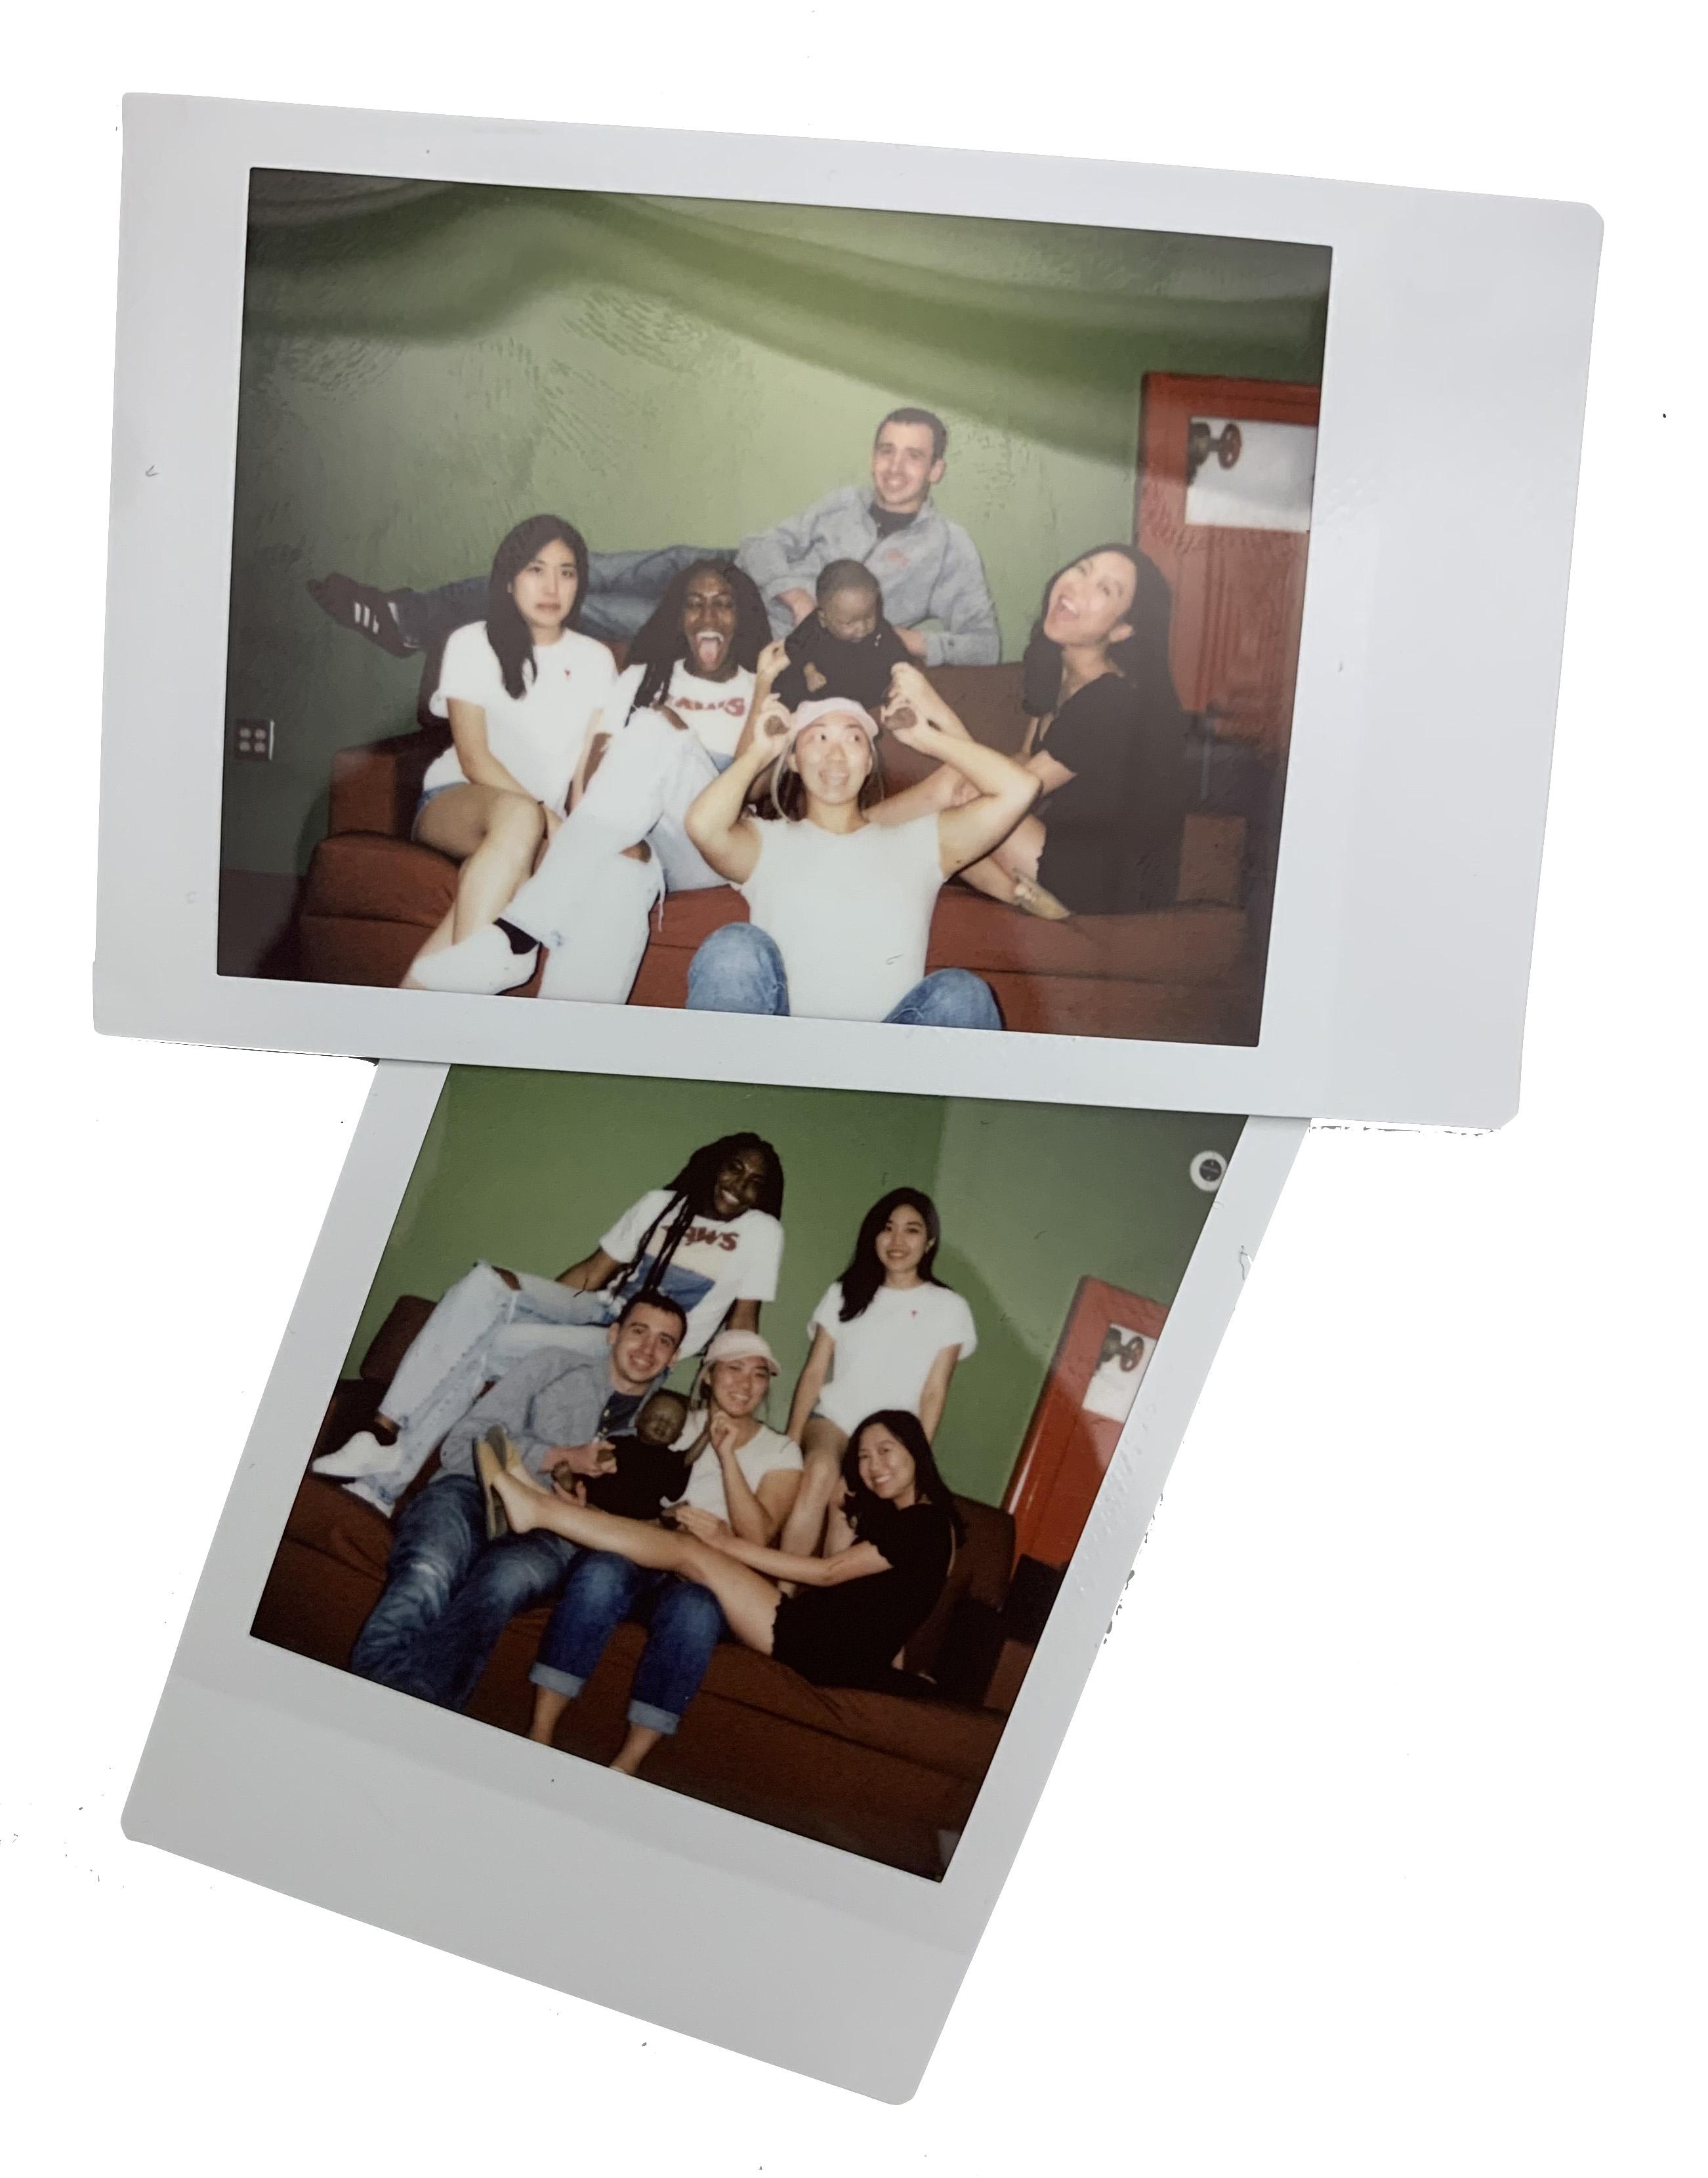 2 slightly overlapping Polaroid photos of this team